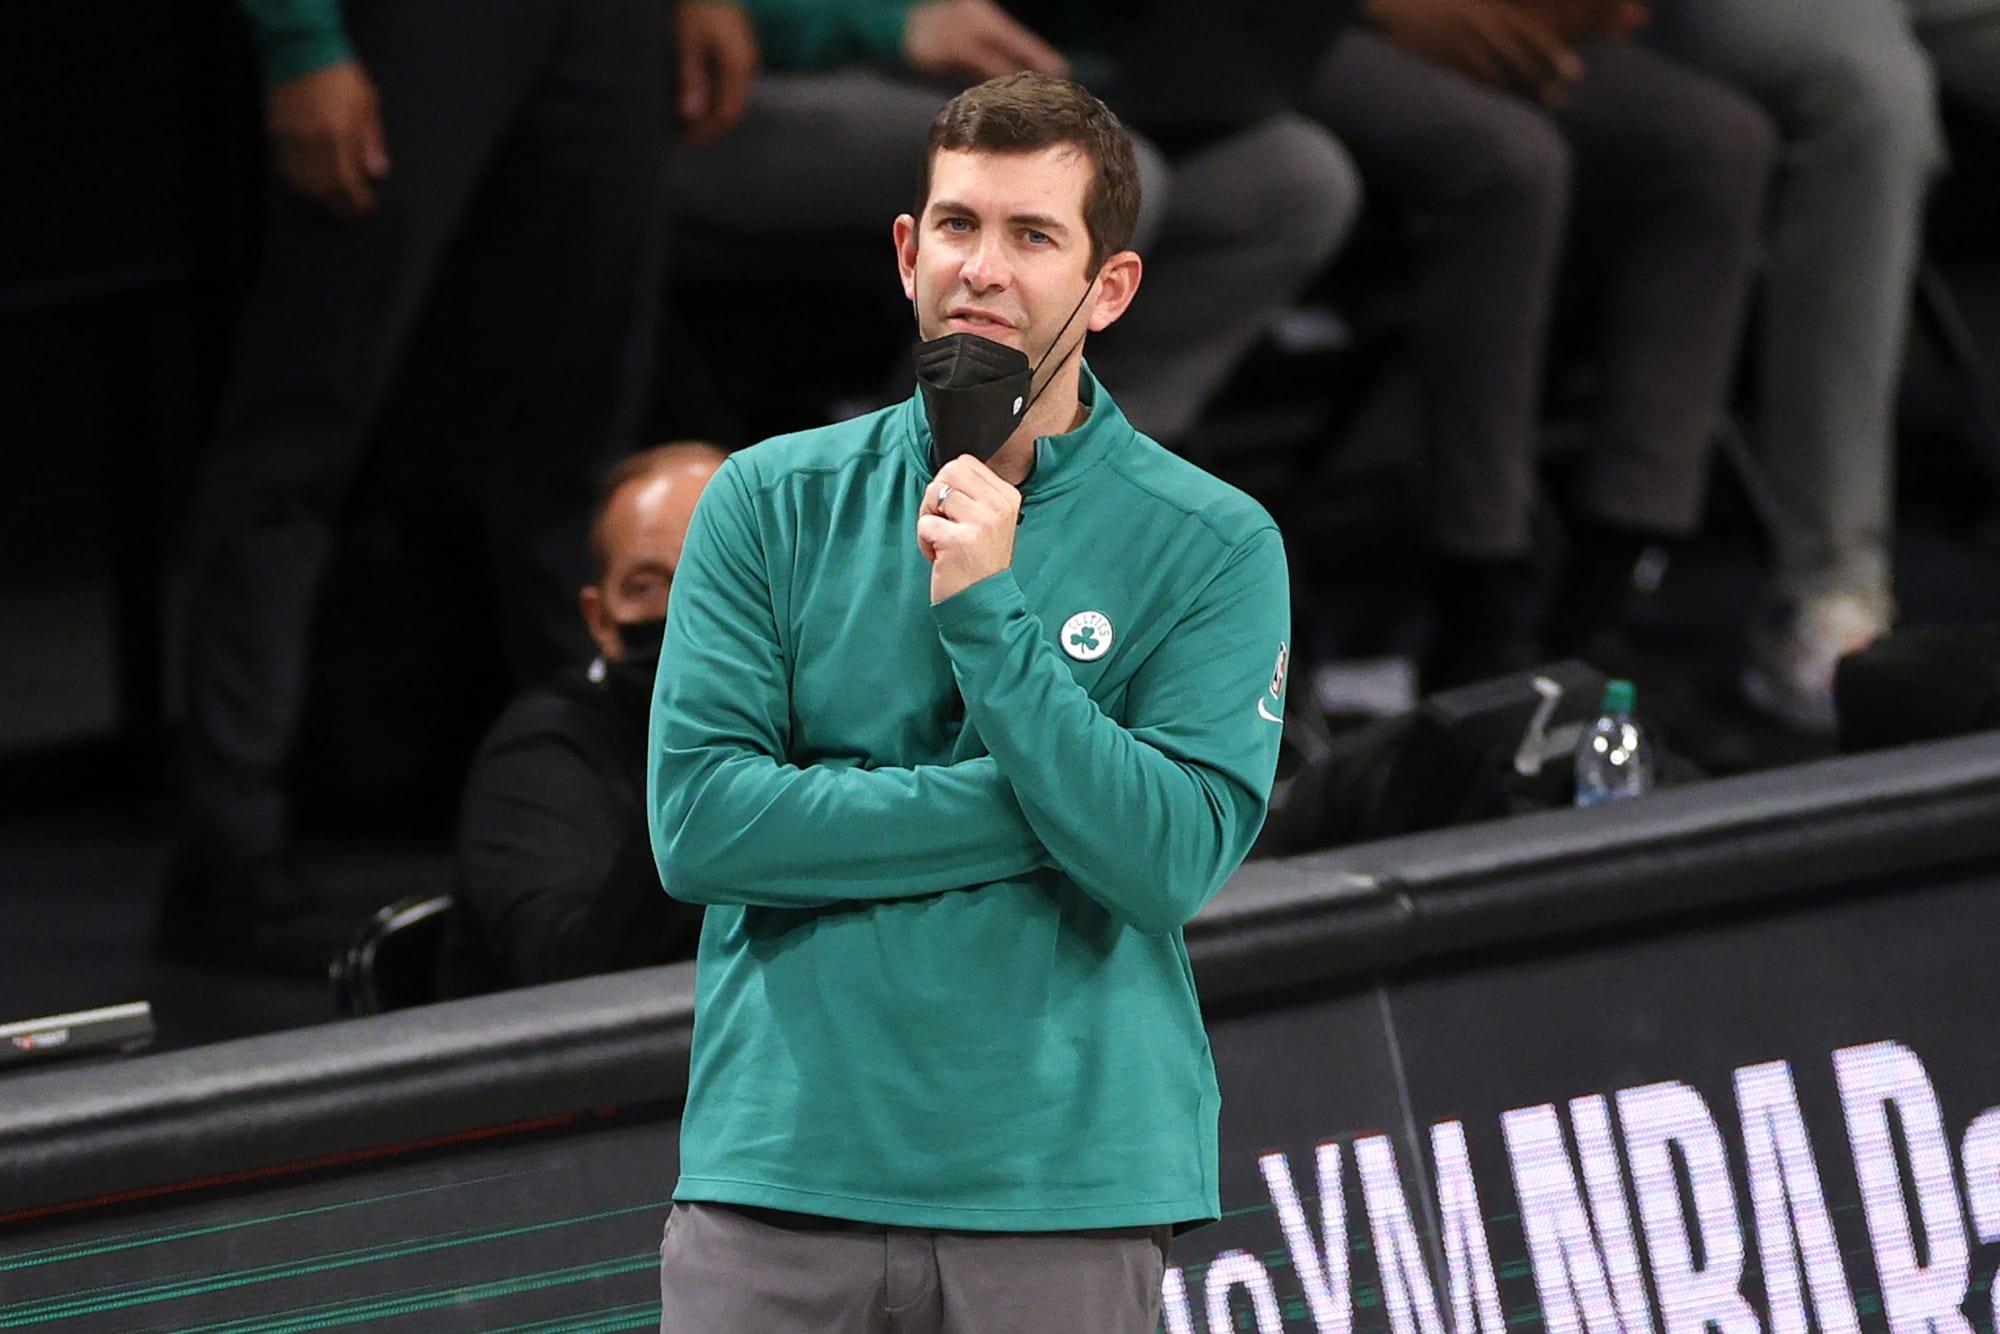 Boston Celtics: Sorry Brad Stevens, you're the odd man out